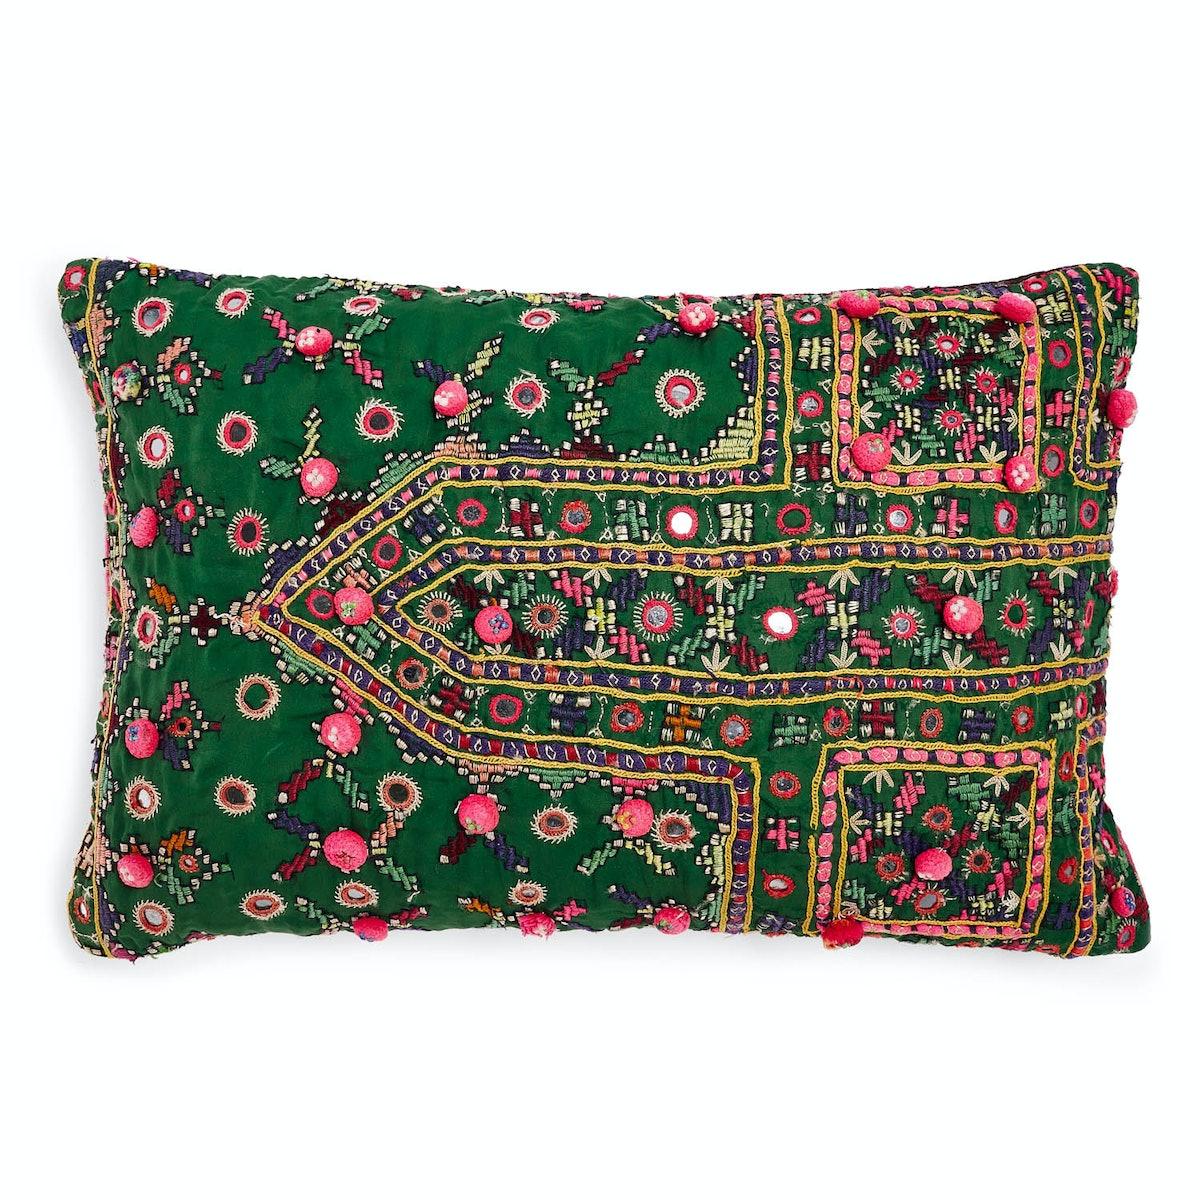 Abcdna pillow